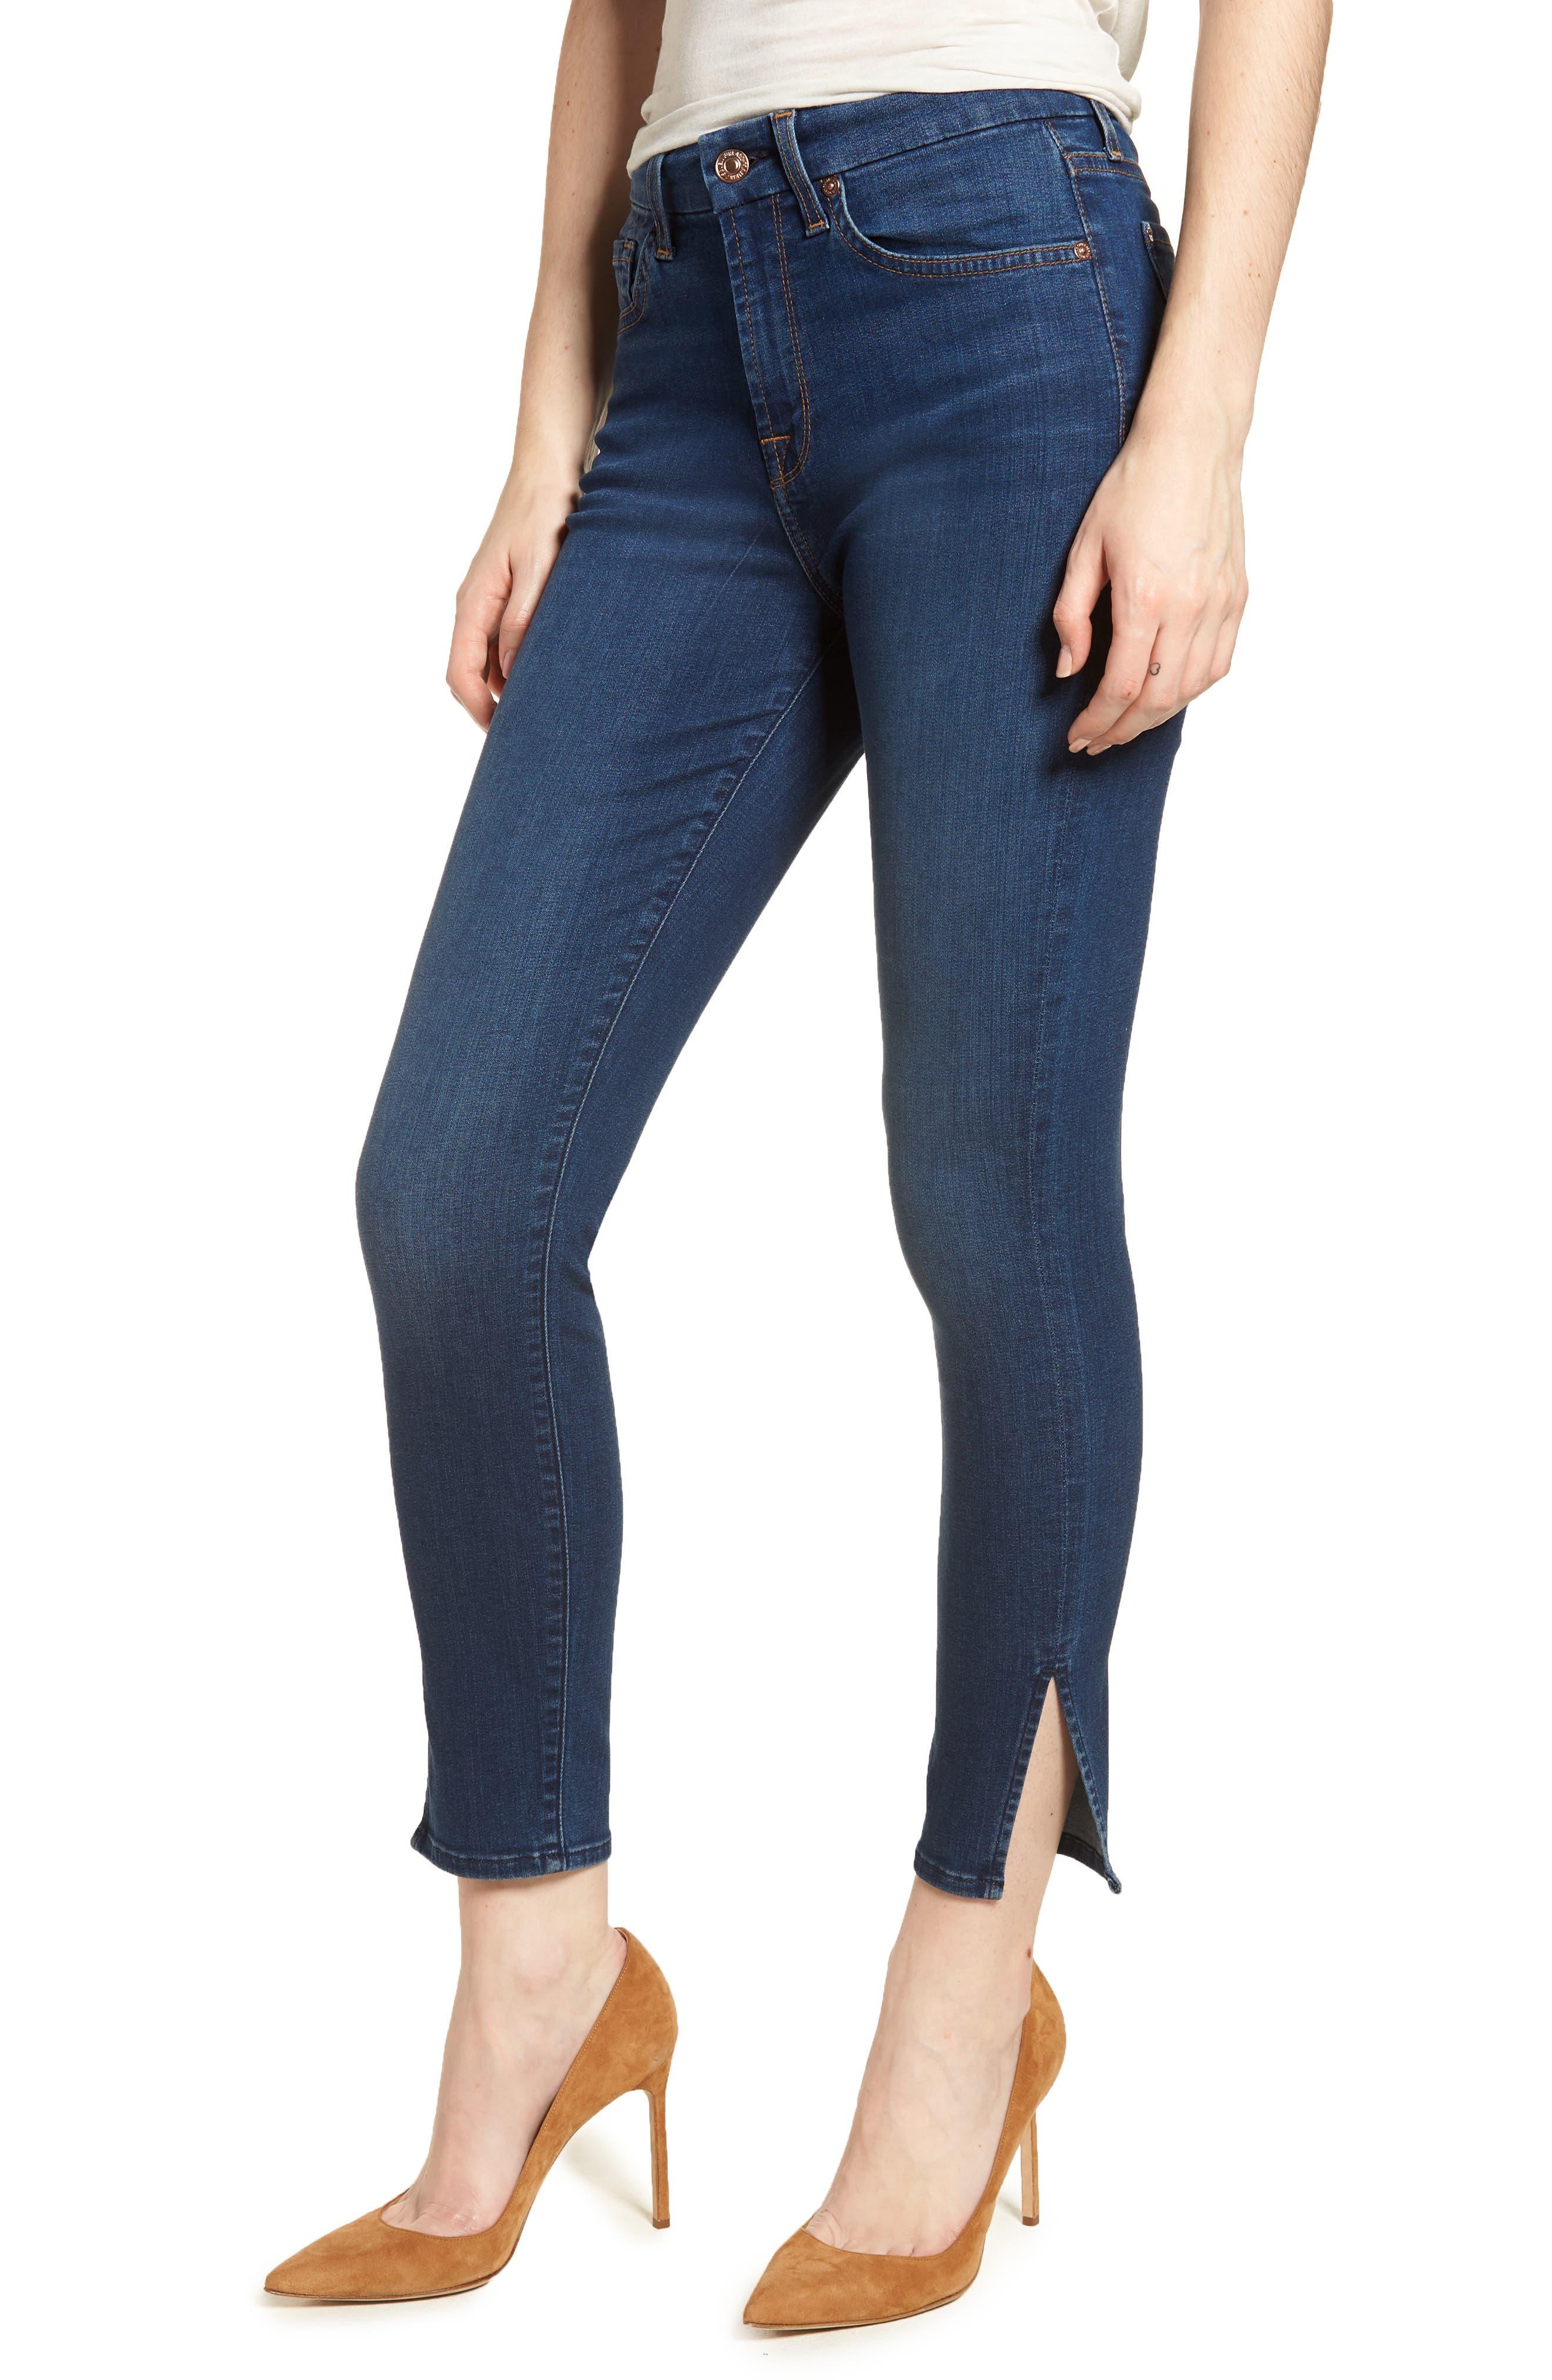 b(air) - Aubrey High Waist Skinny Jeans,                             Main thumbnail 1, color,                             Bair Fresh Rinse